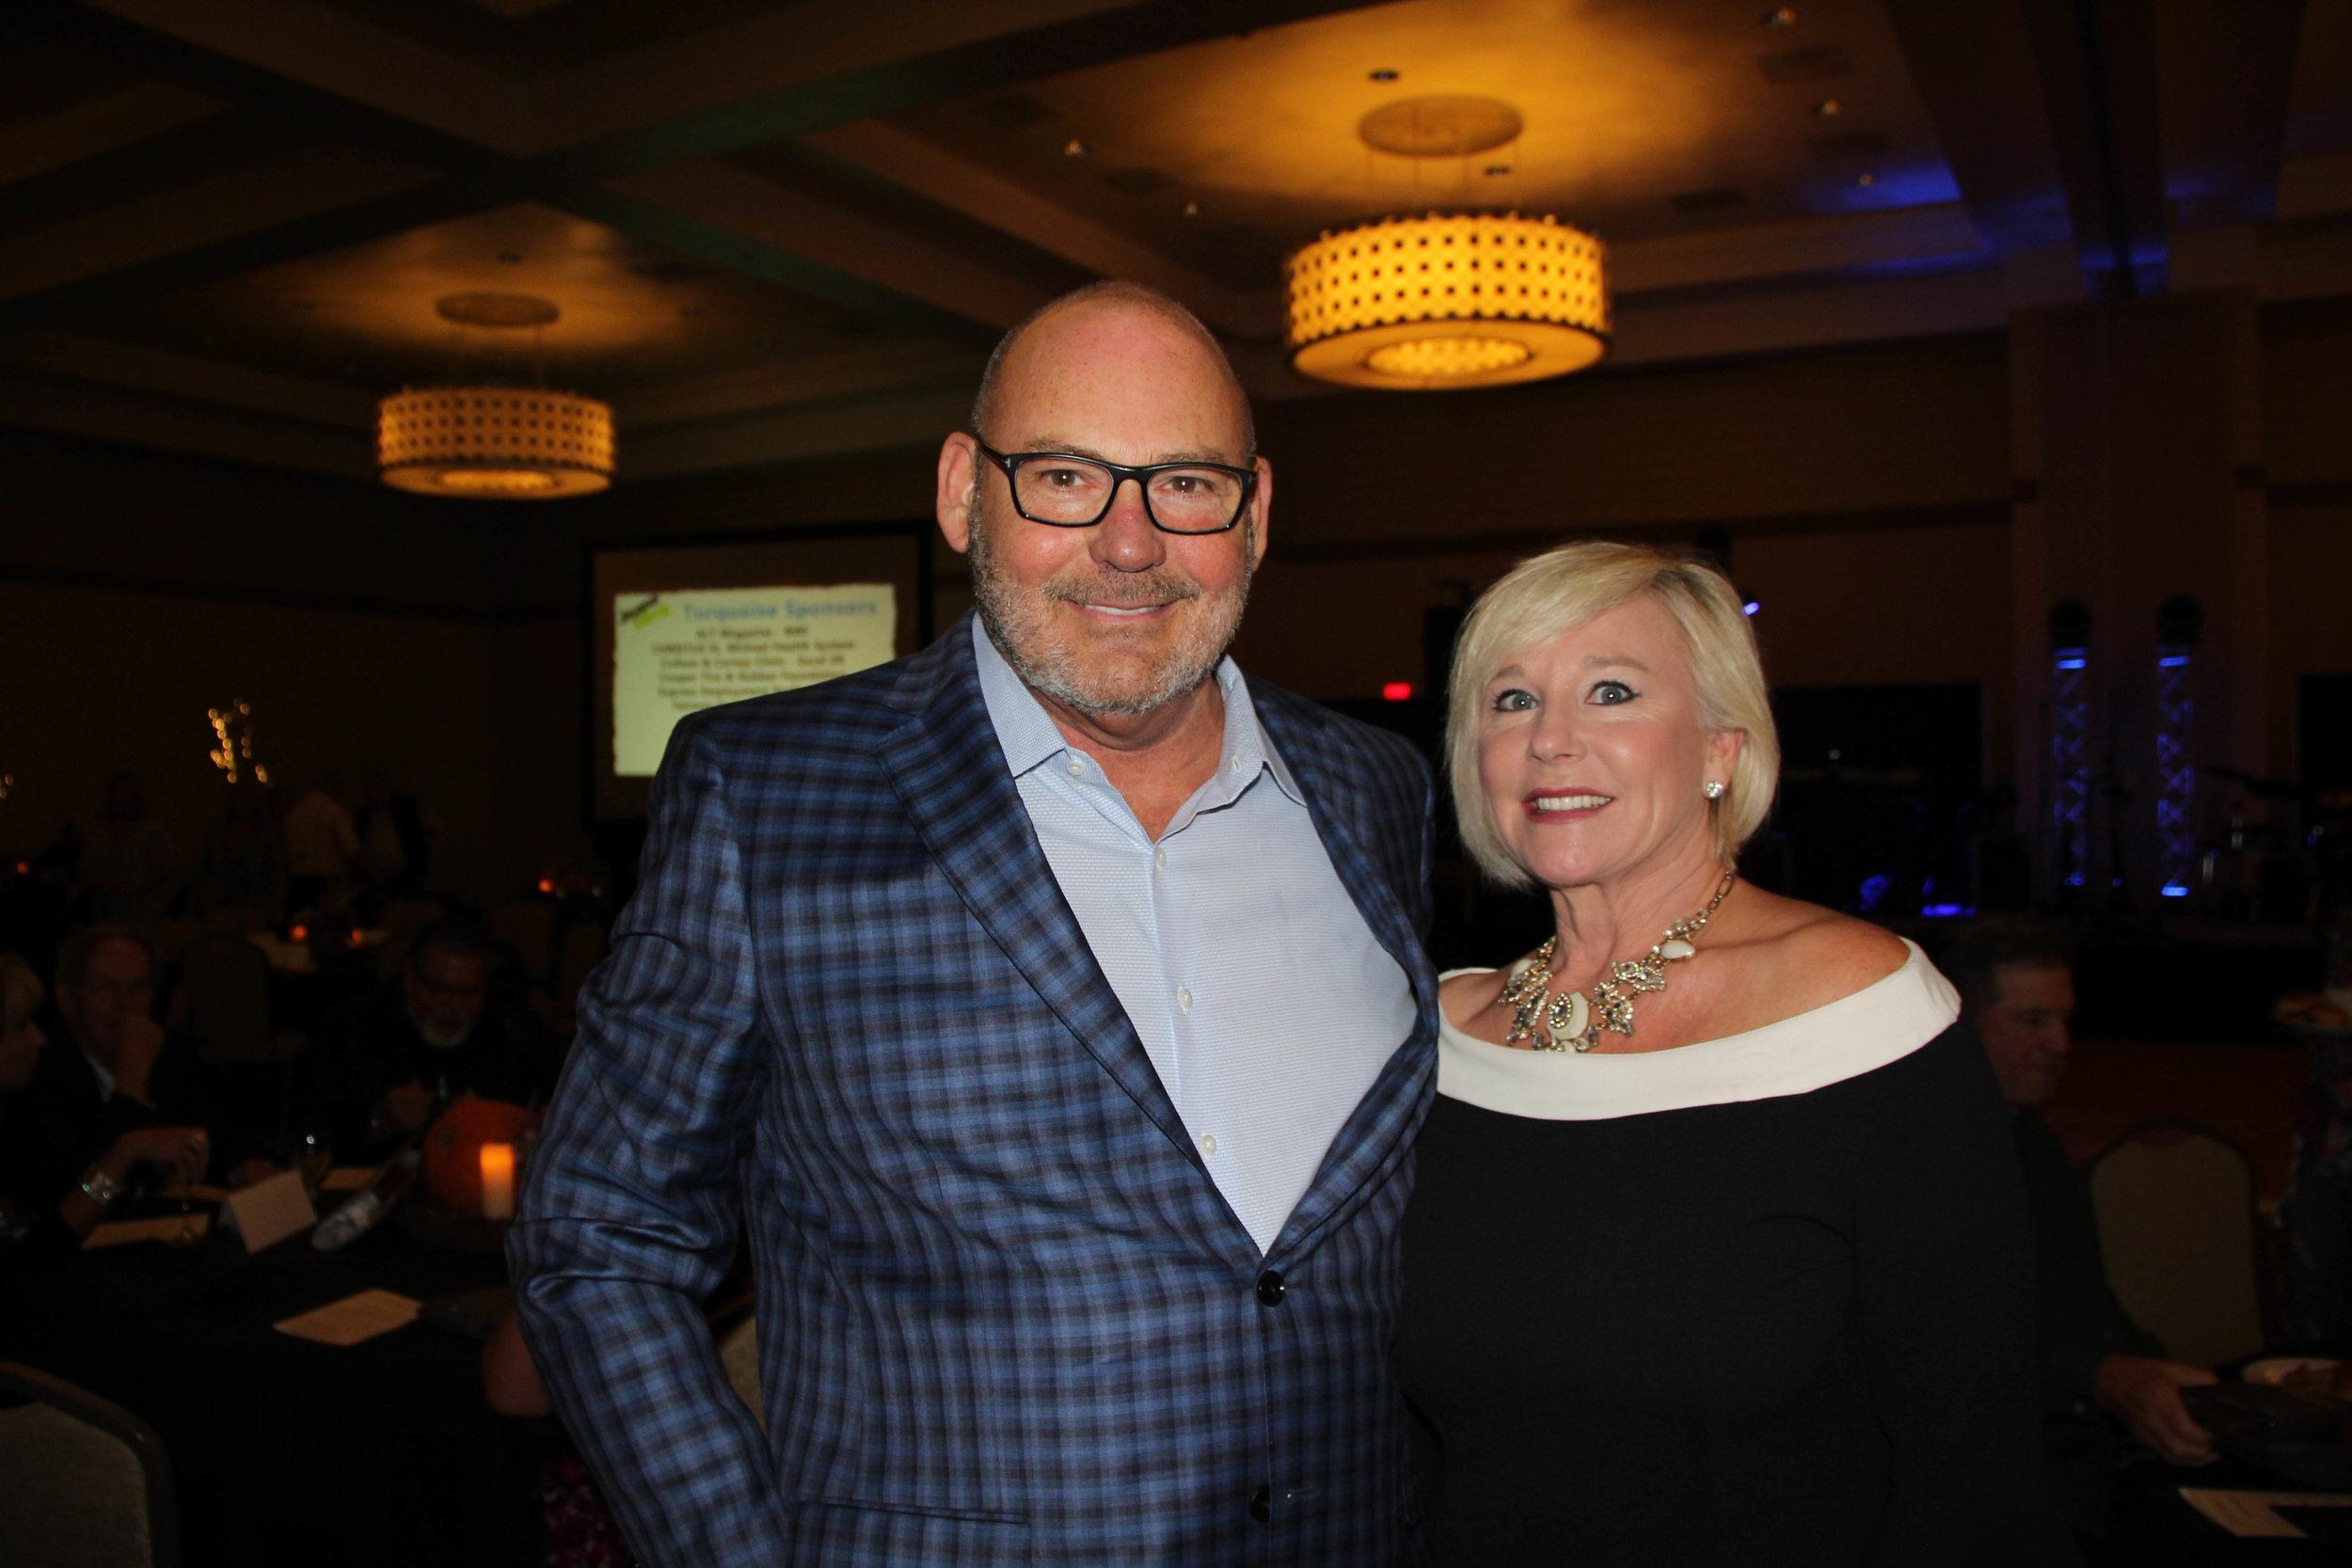 Richard Reynolds and Pam Hollingsworth